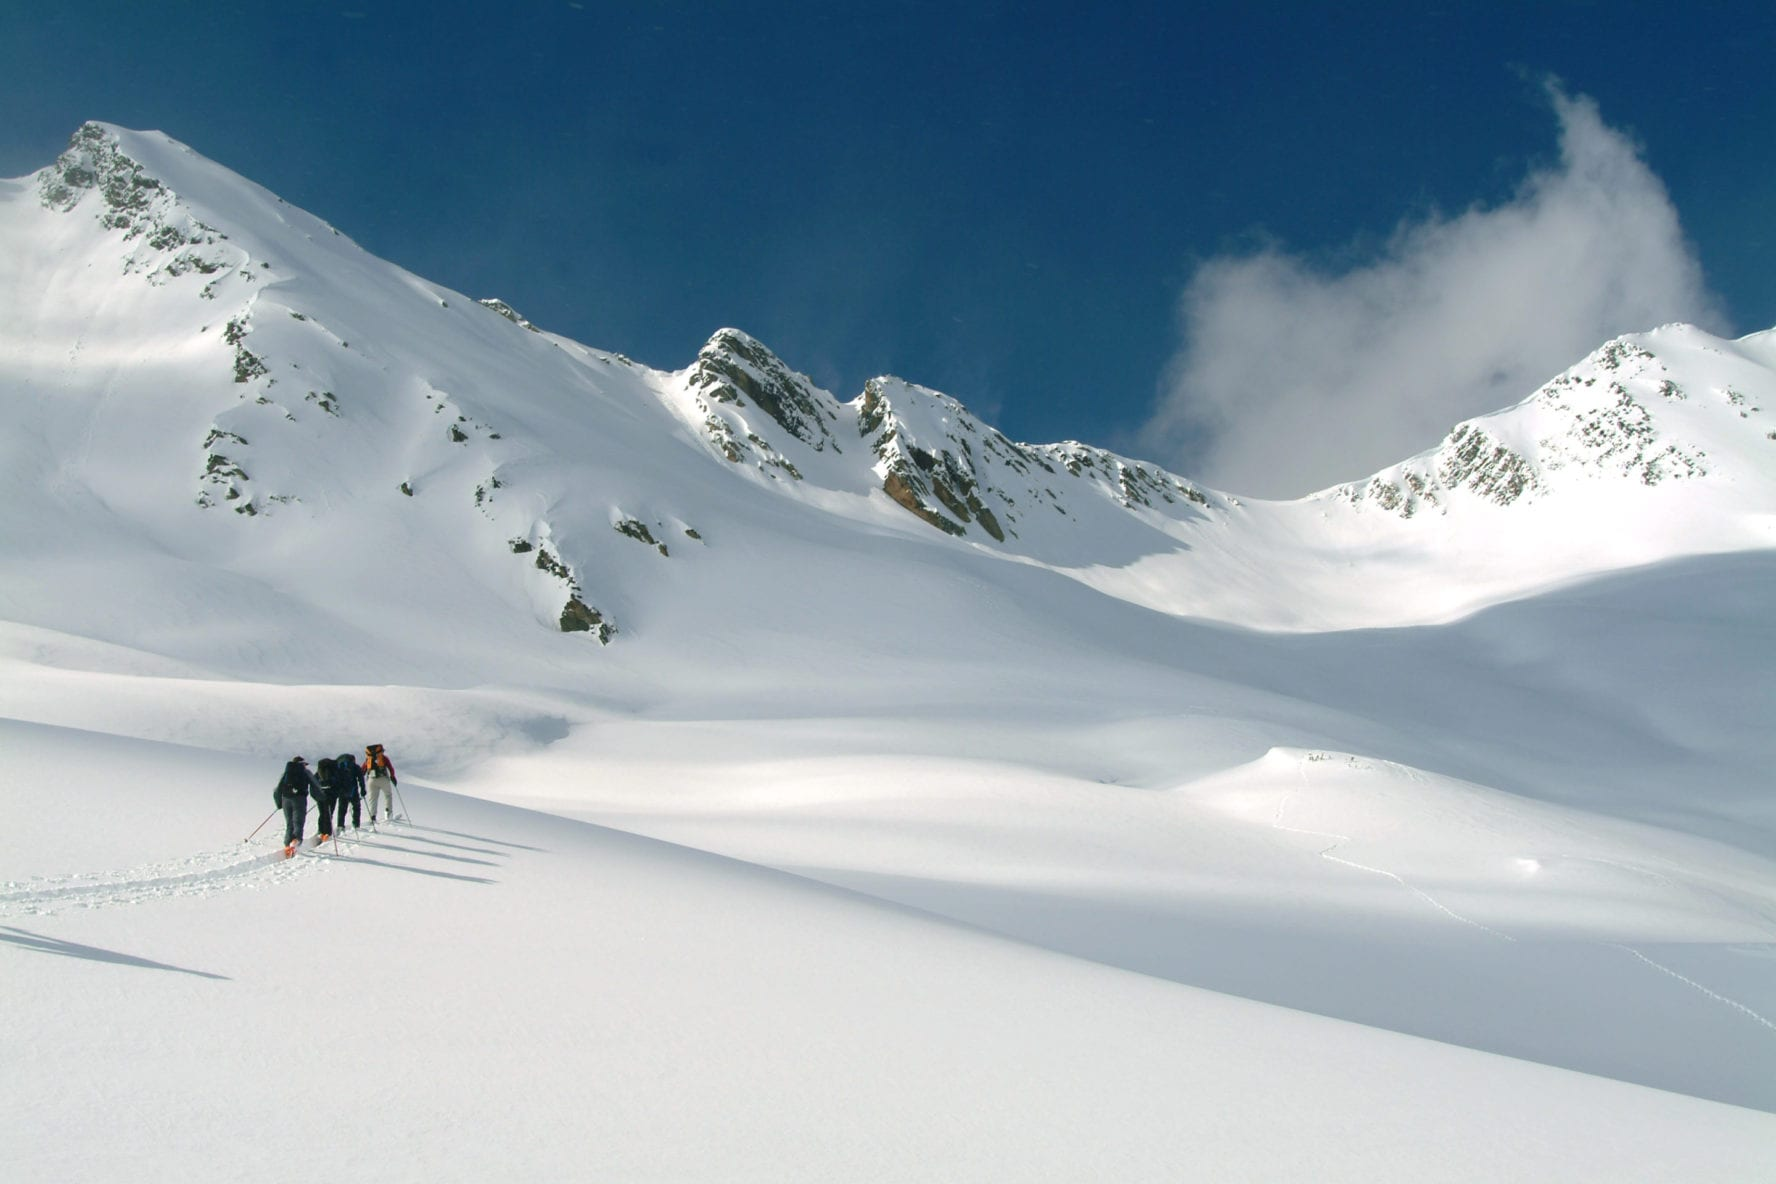 Ski Touring in Canadian Rockies